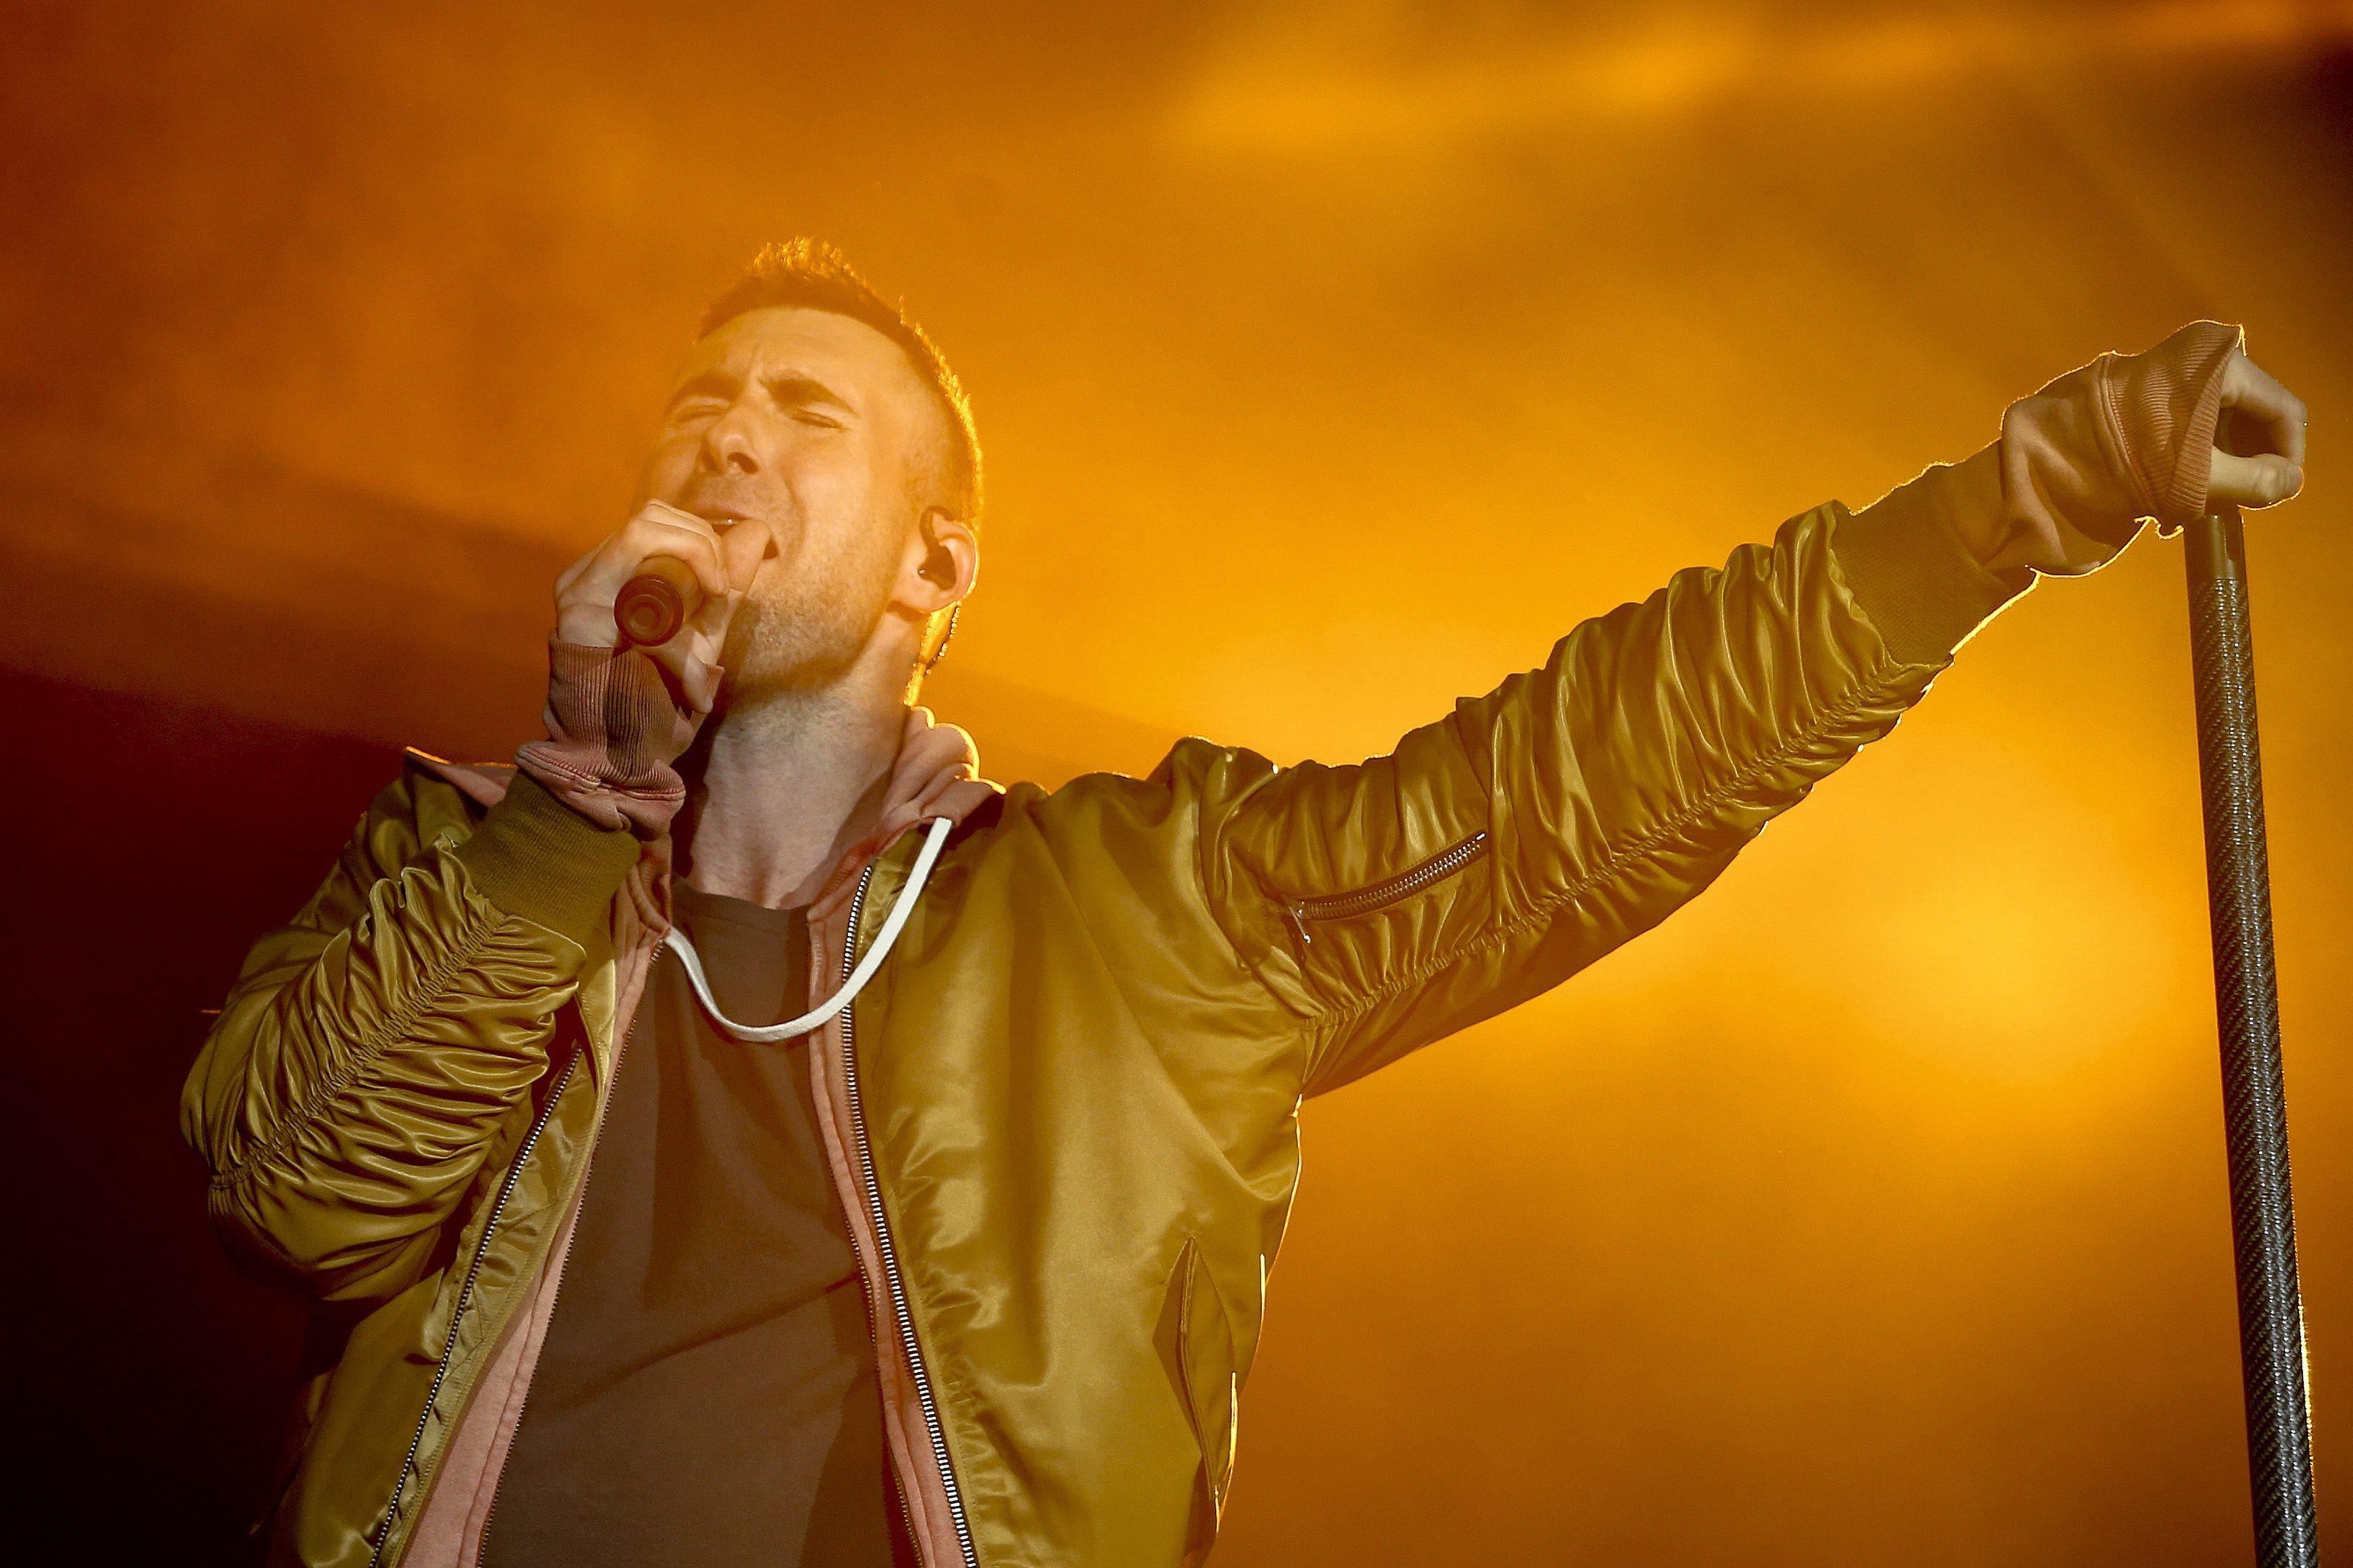 Maroon 5 com comboio de 'hits' pop a alta velocidade